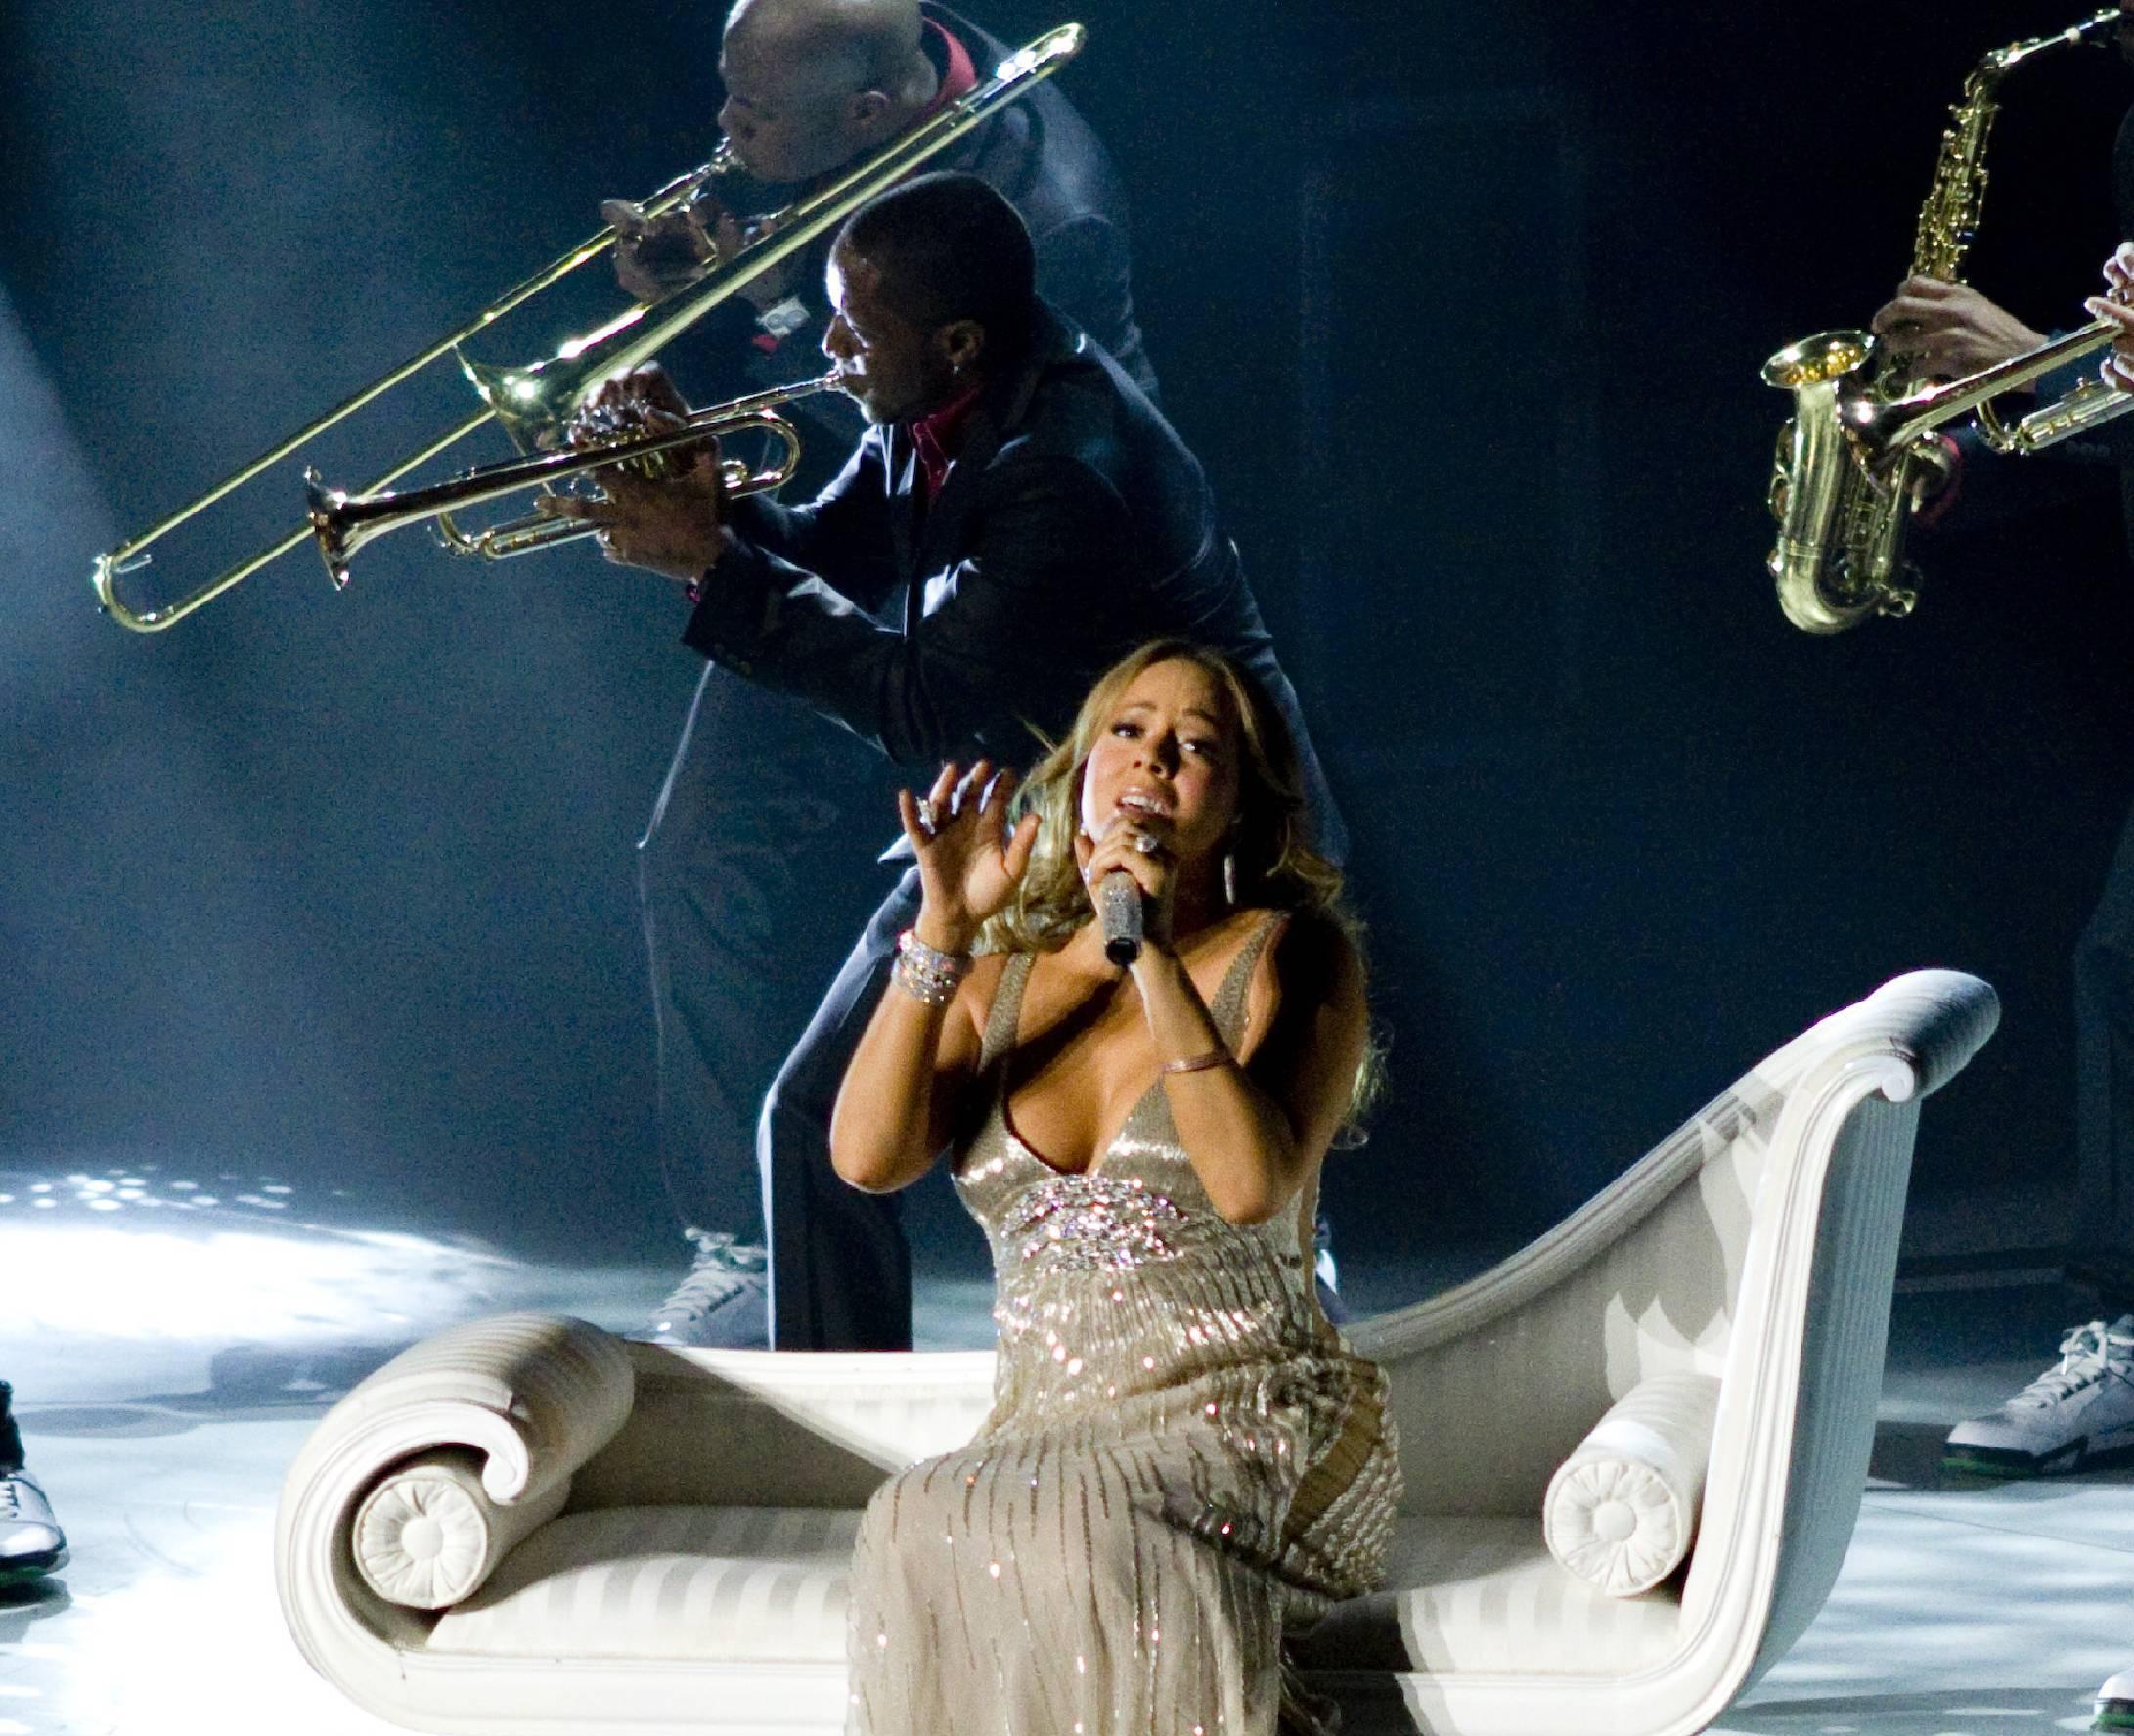 Mariah Loves Those Angels